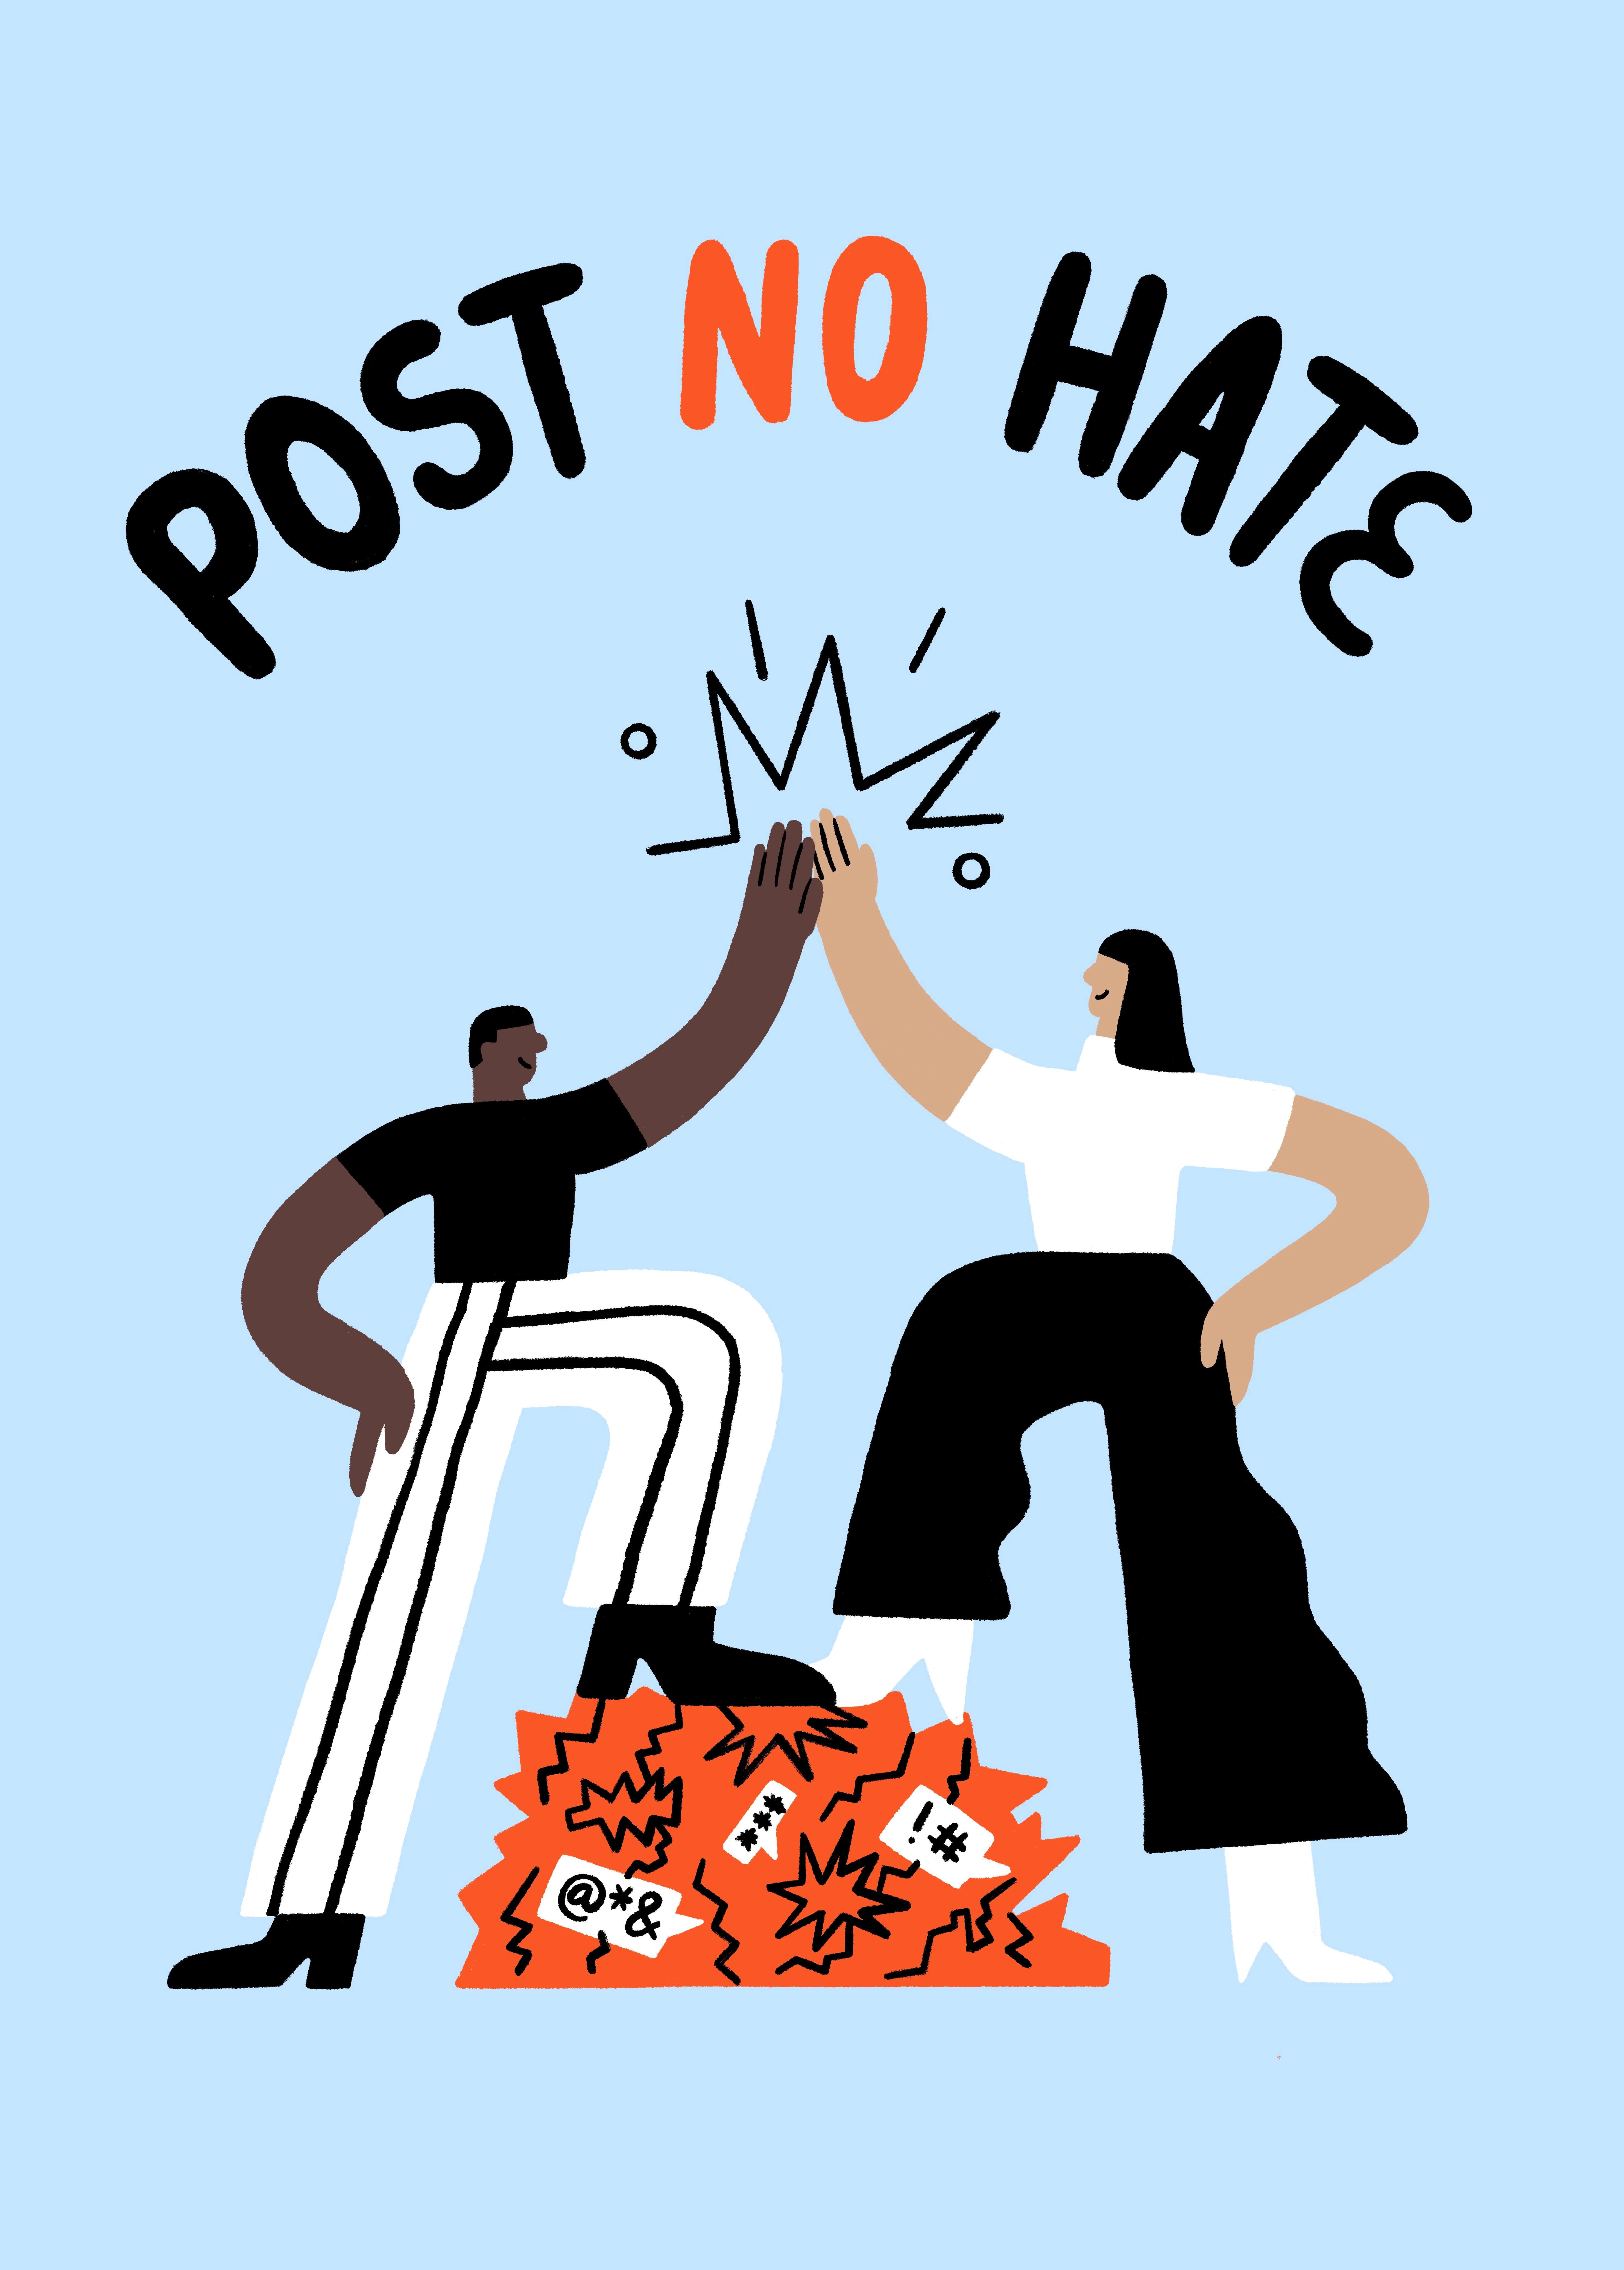 Post No Hate main image